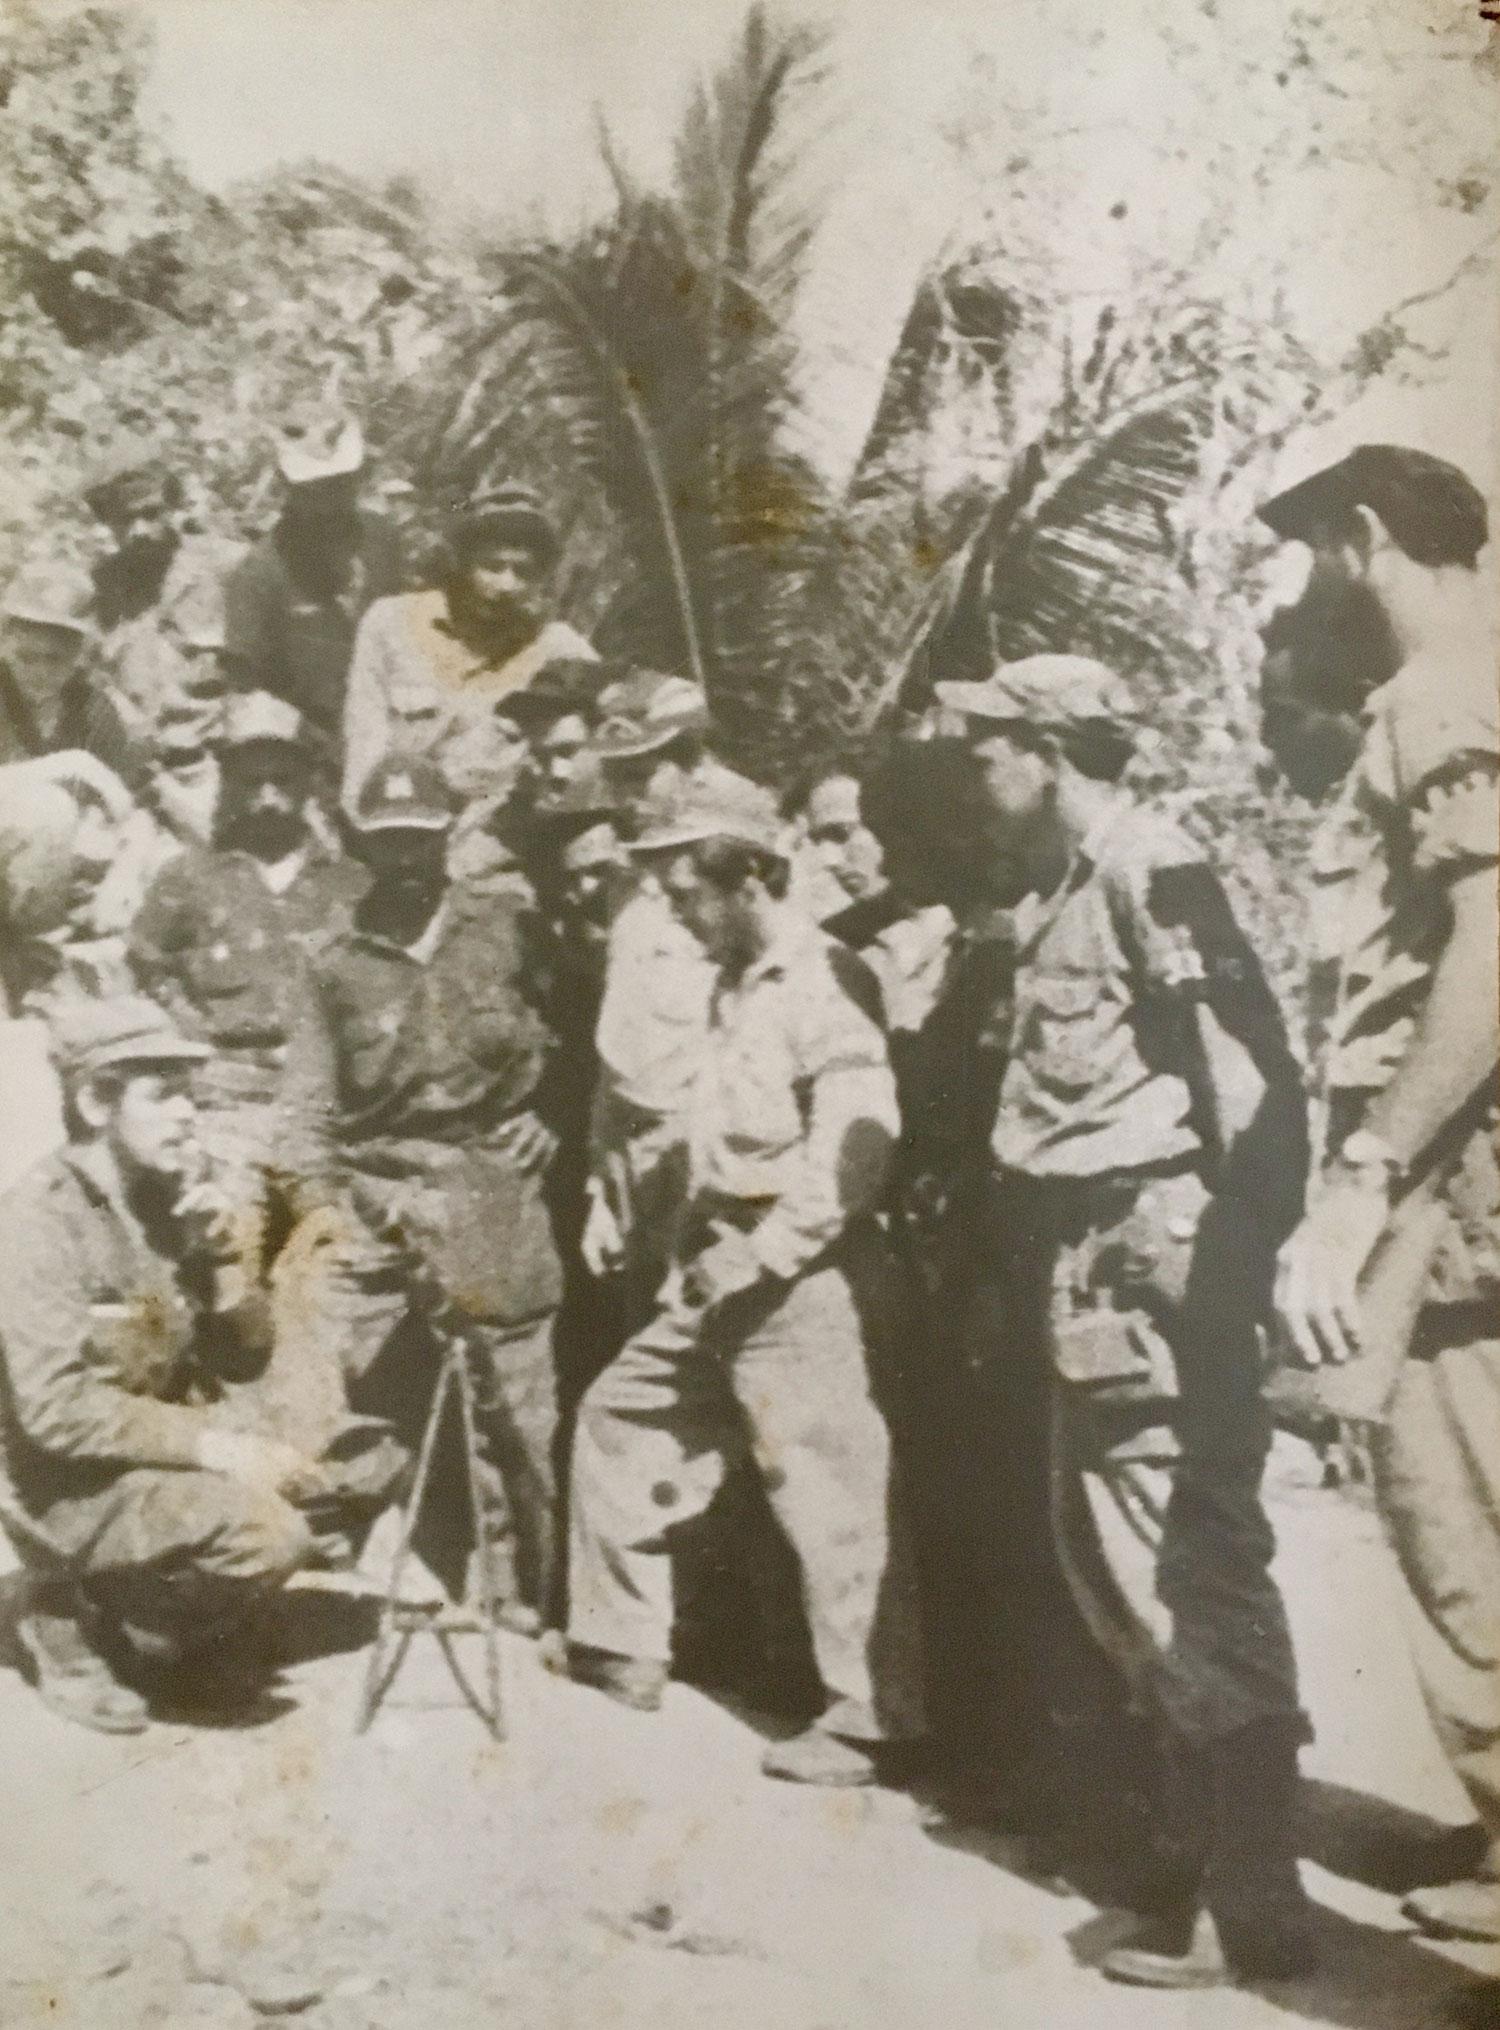 Hammocks_and_Ruins_What_to_Do_Cuba_Havana_island_museum_of_revolution_26.jpg